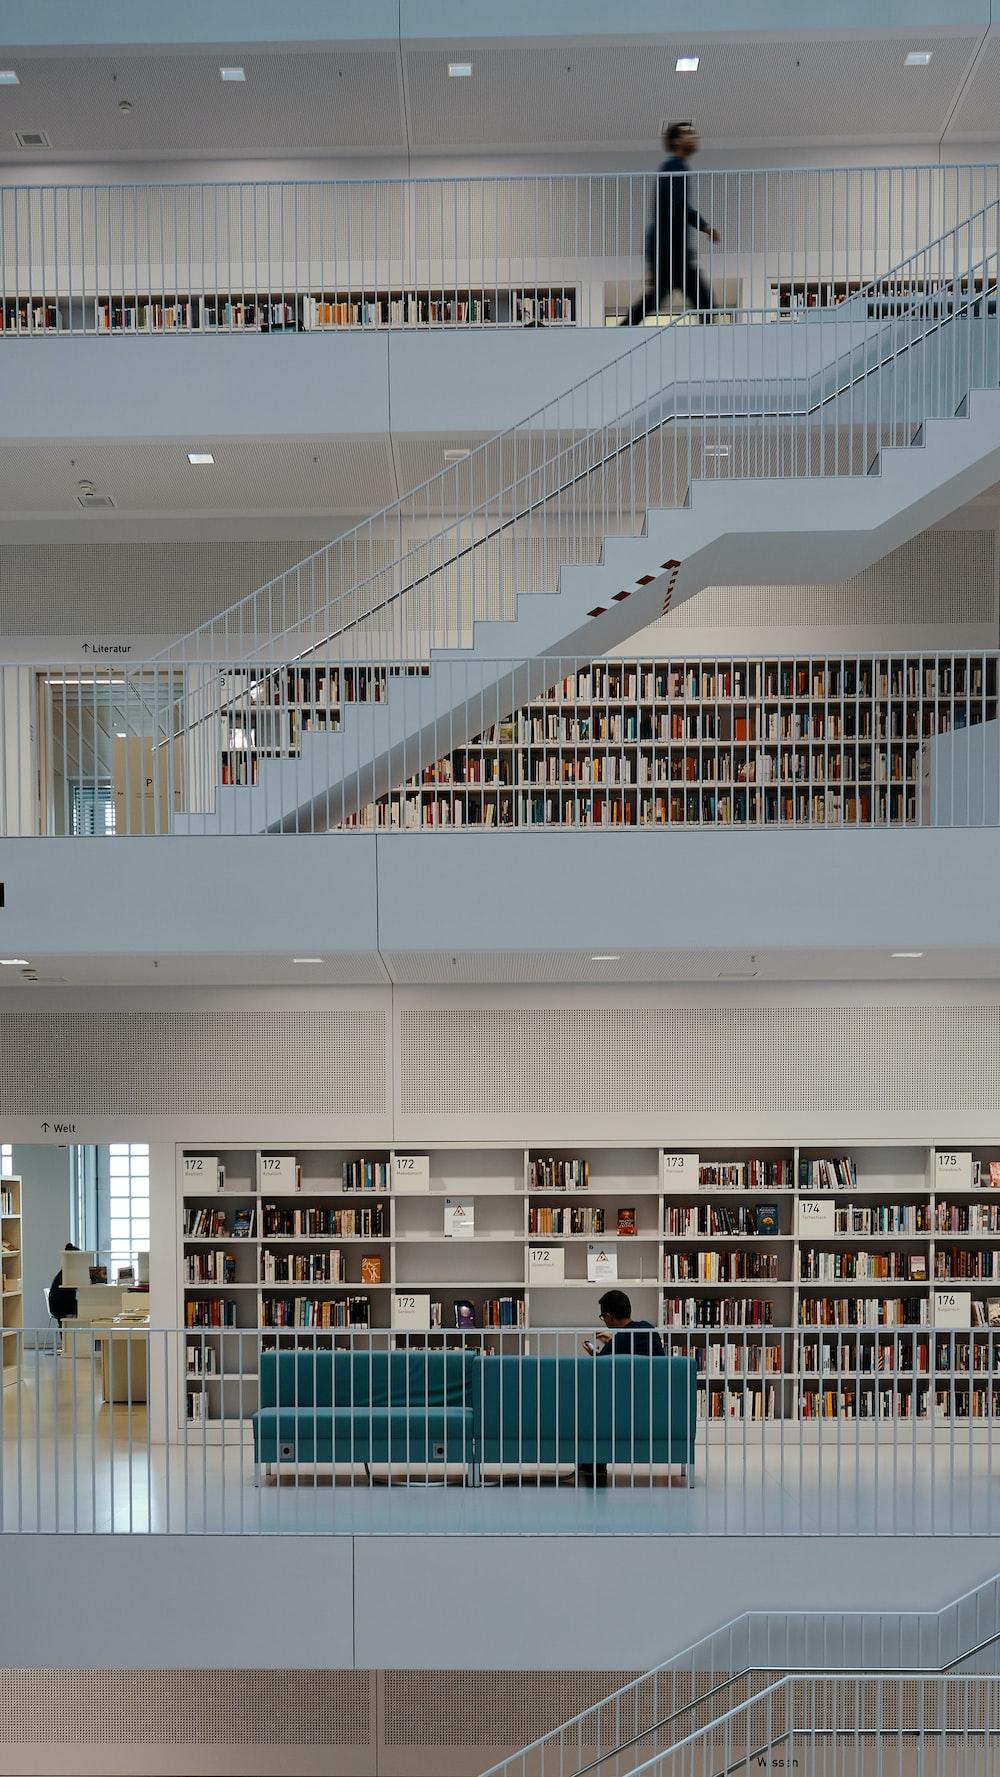 man walking on library